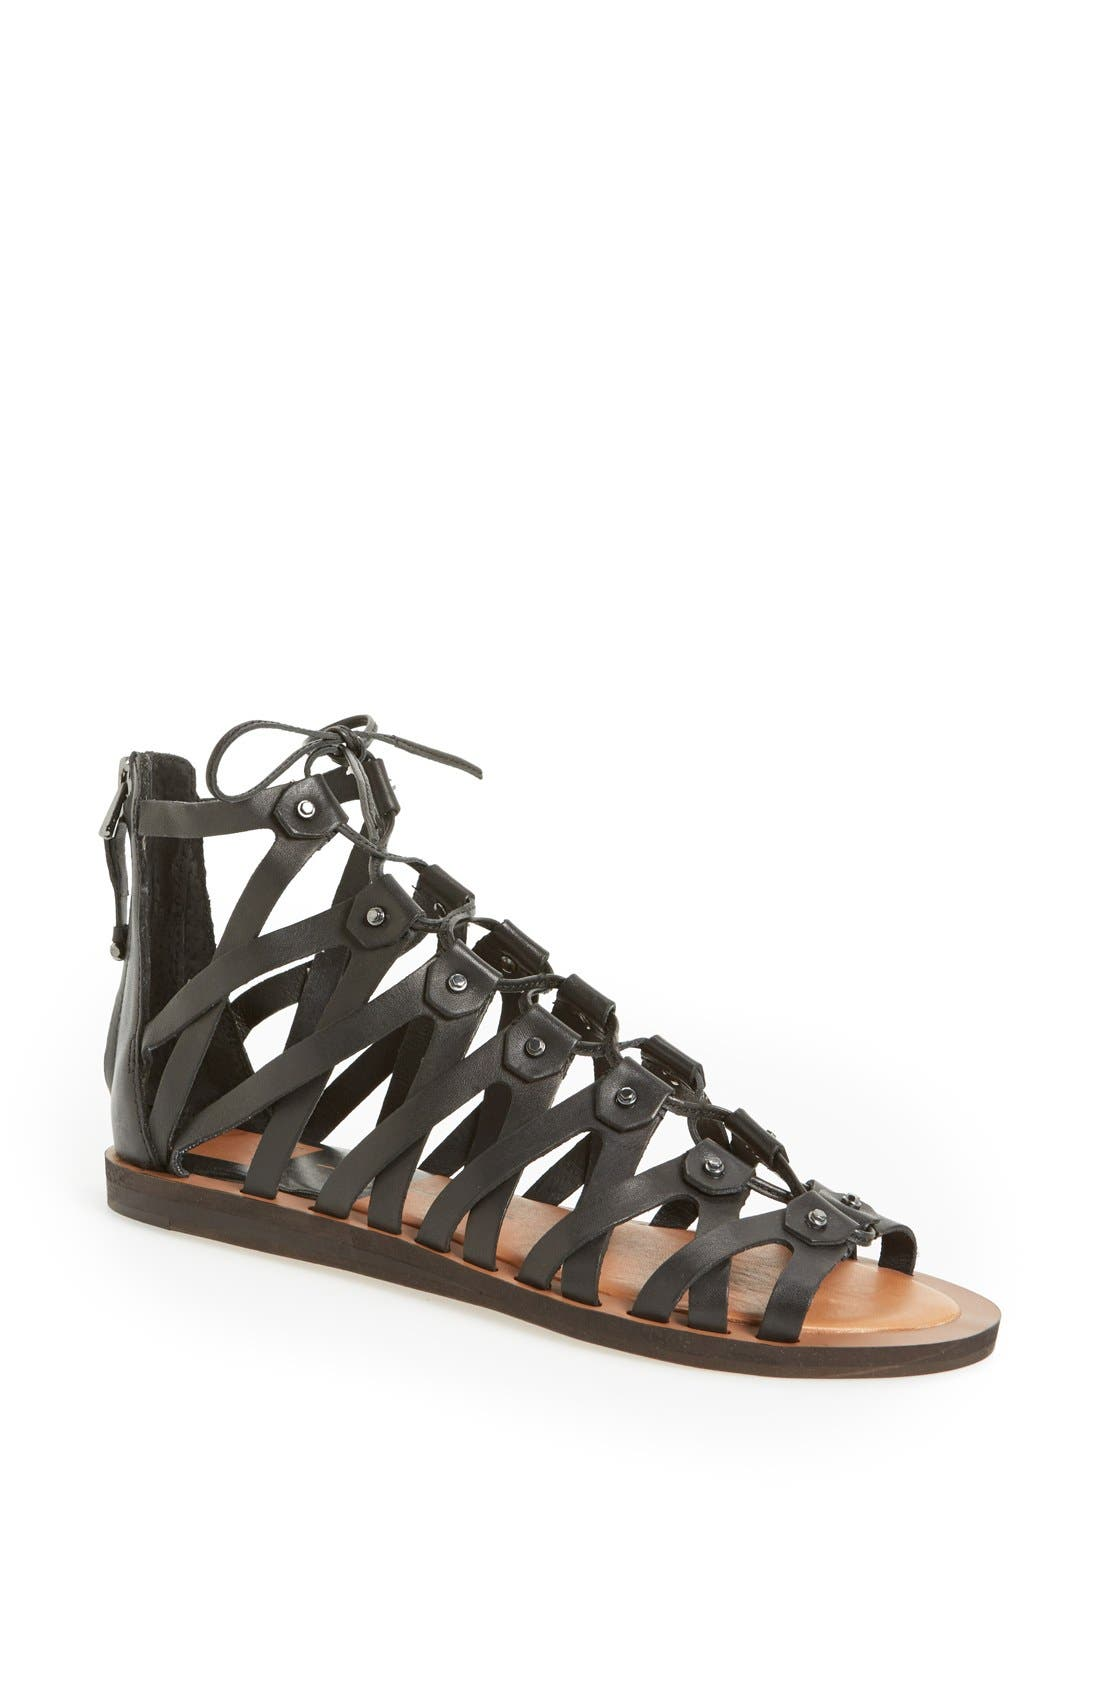 Alternate Image 1 Selected - Dolce Vita 'Fray' Sandal